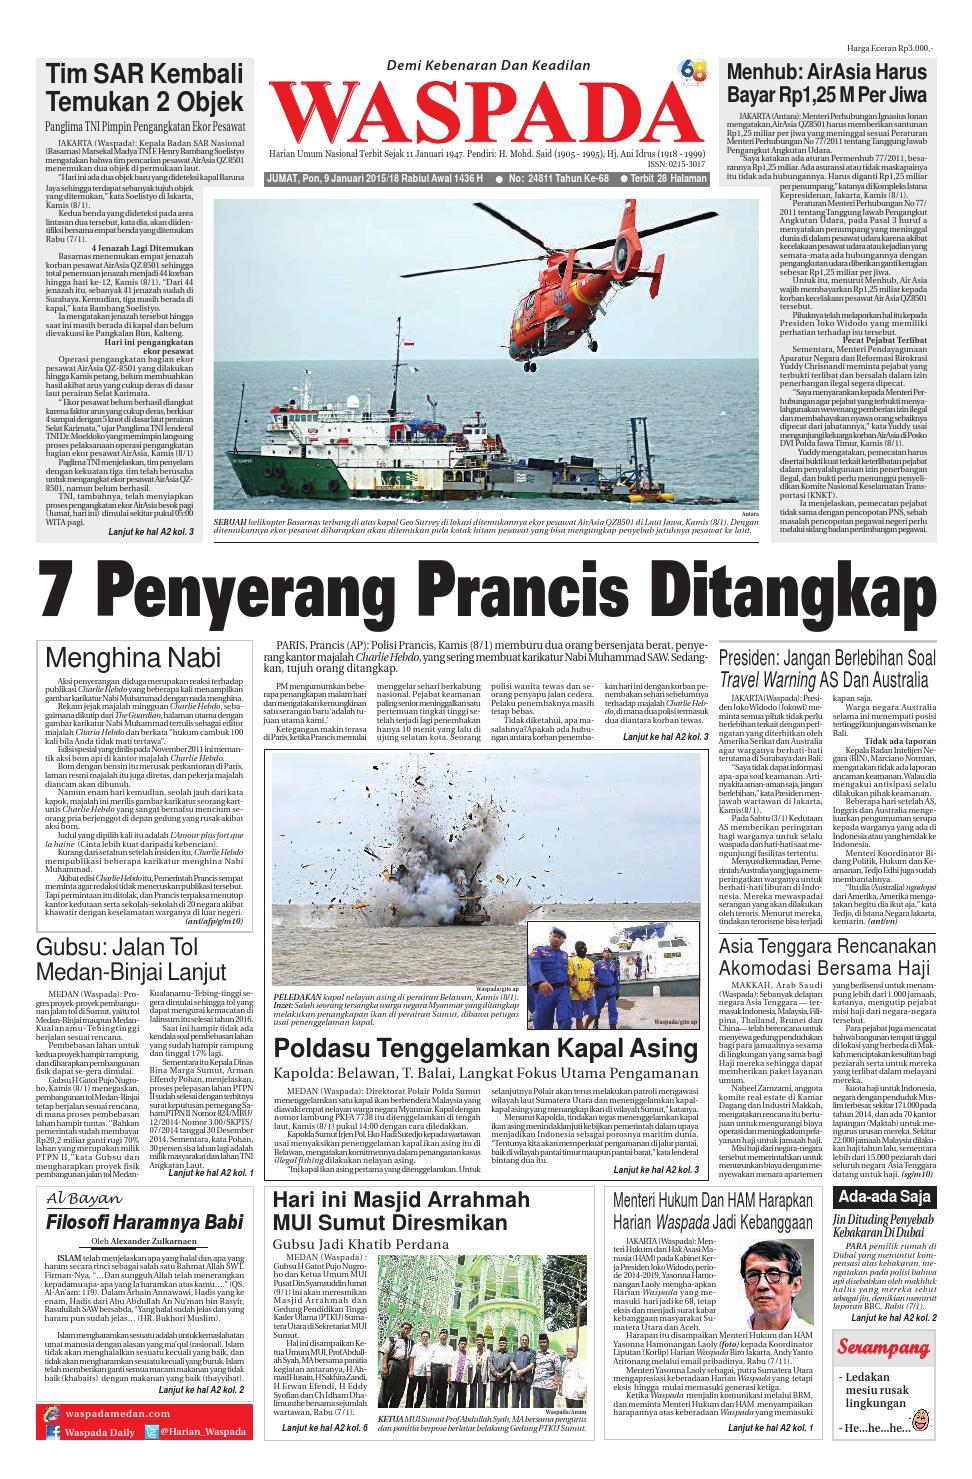 Waspada Jumat 9 Januari 2014 By Harian Waspada Issuu